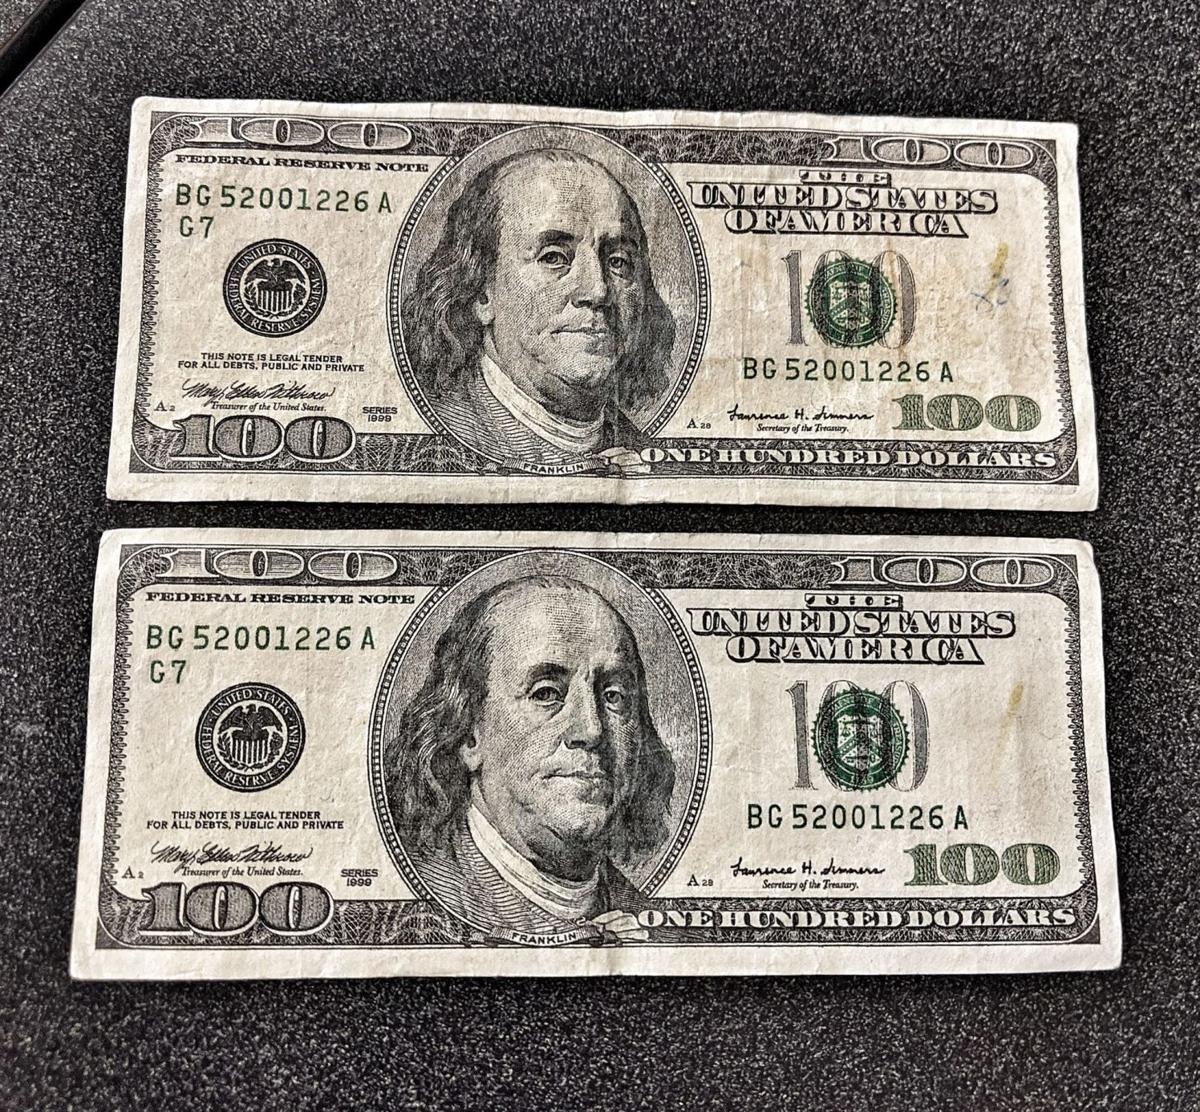 Seymour, Indiana, counterfeit money